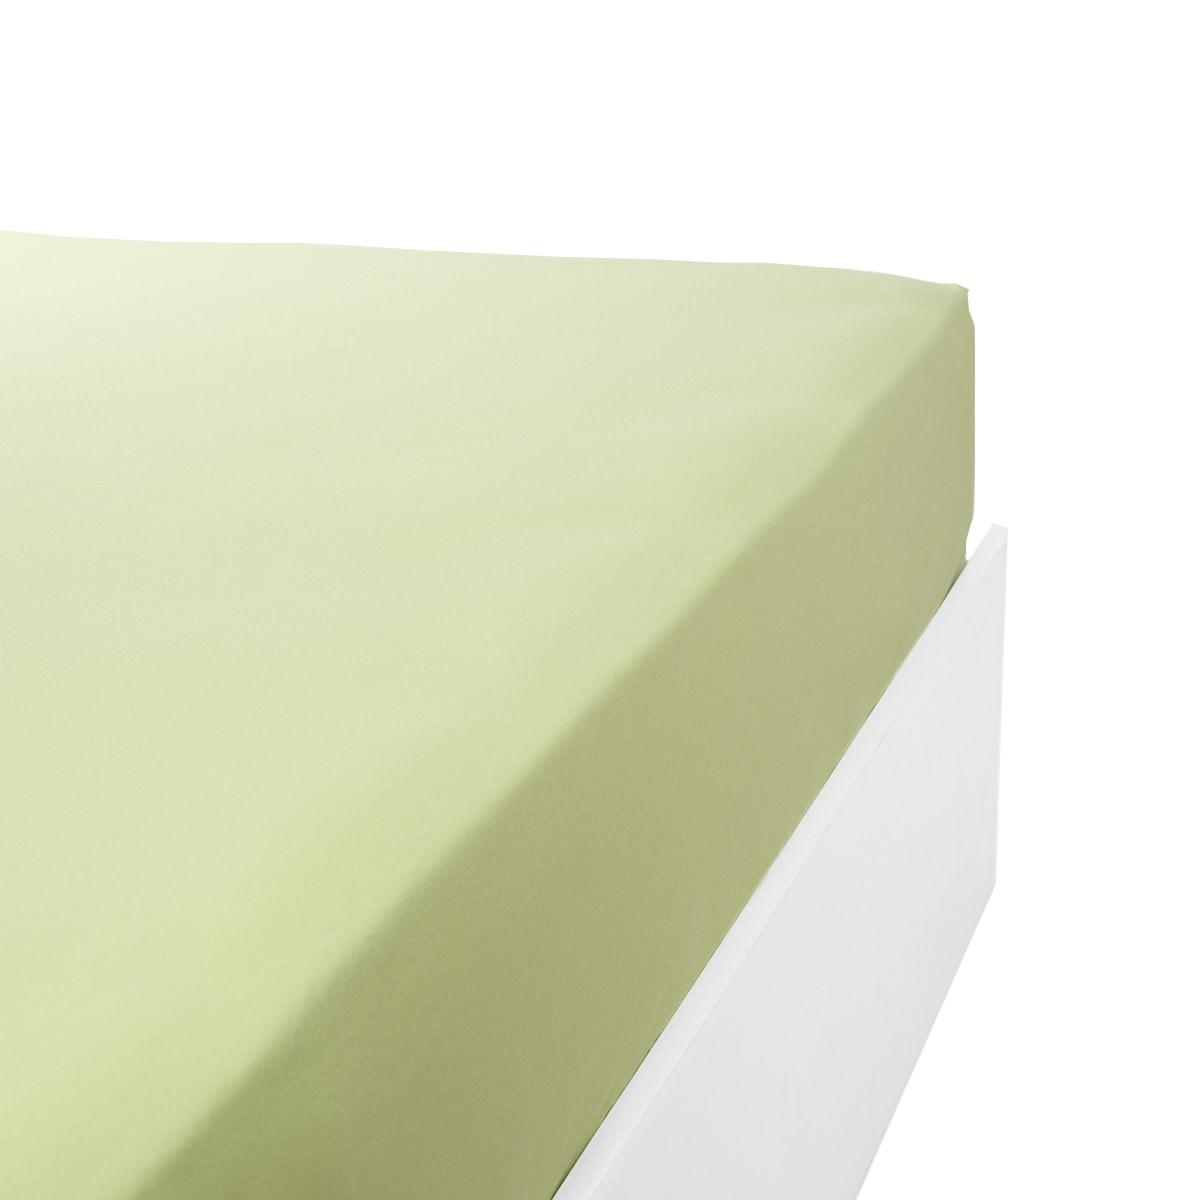 Drap housse flanelle en Molleton Vert anis 160x200 cm